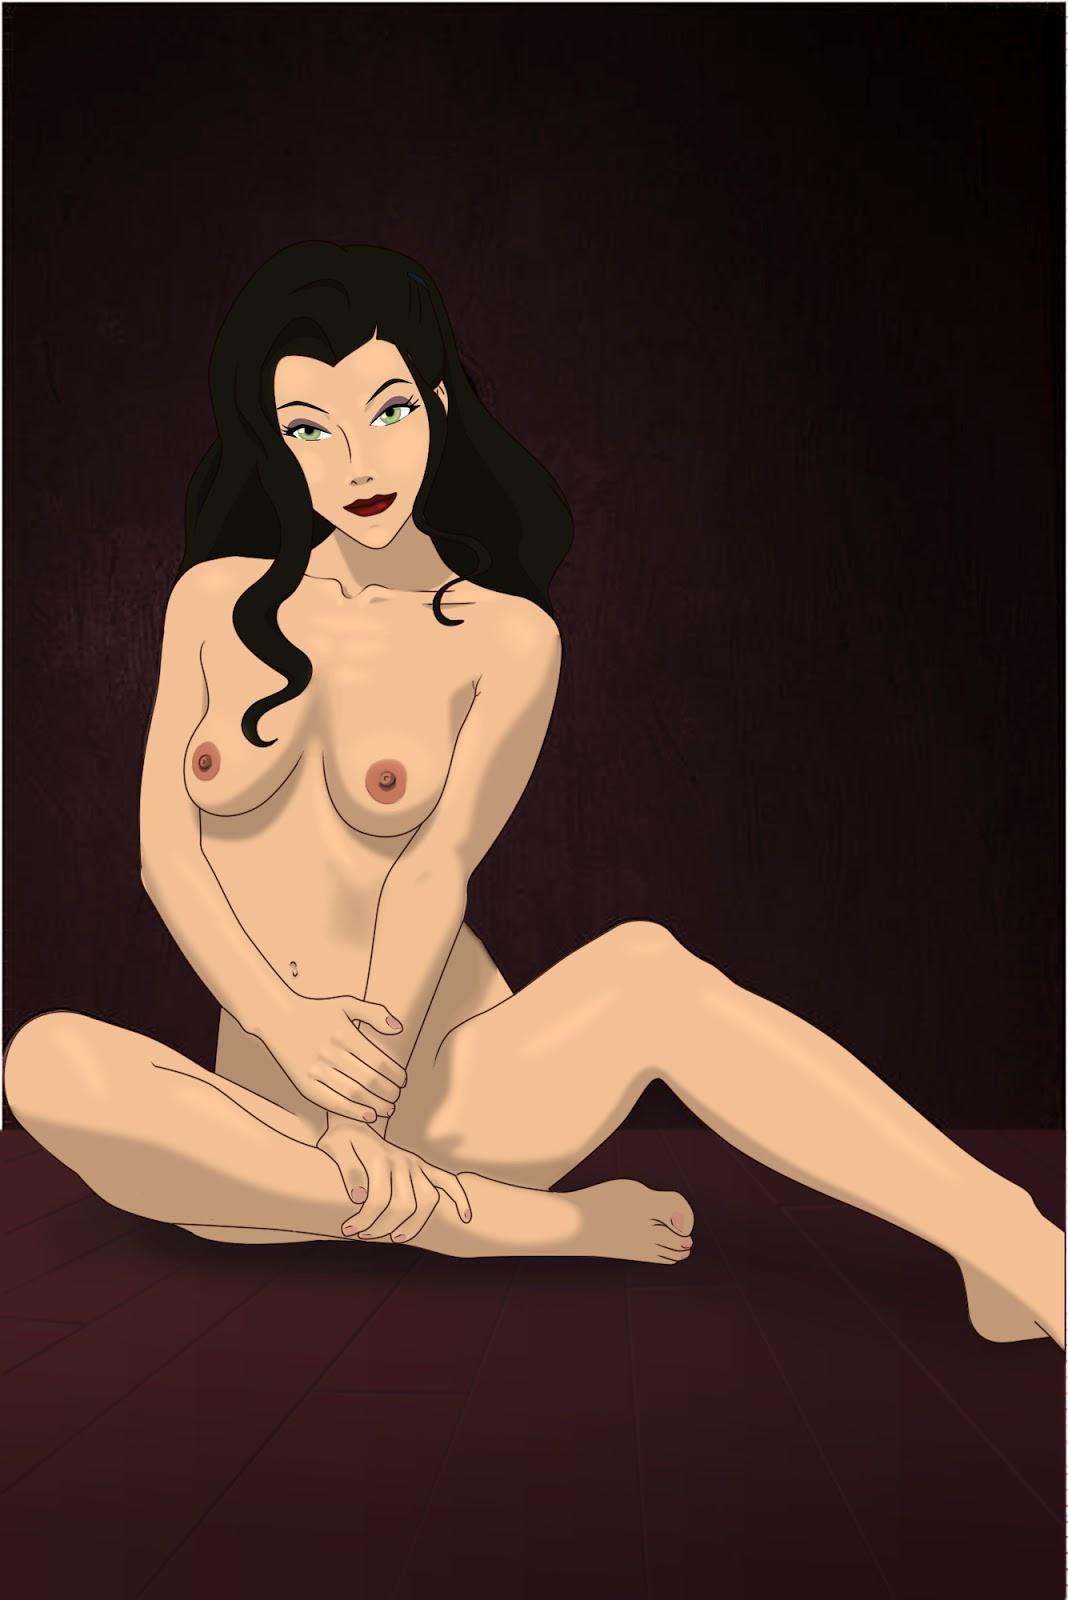 Erotic massage video genitals